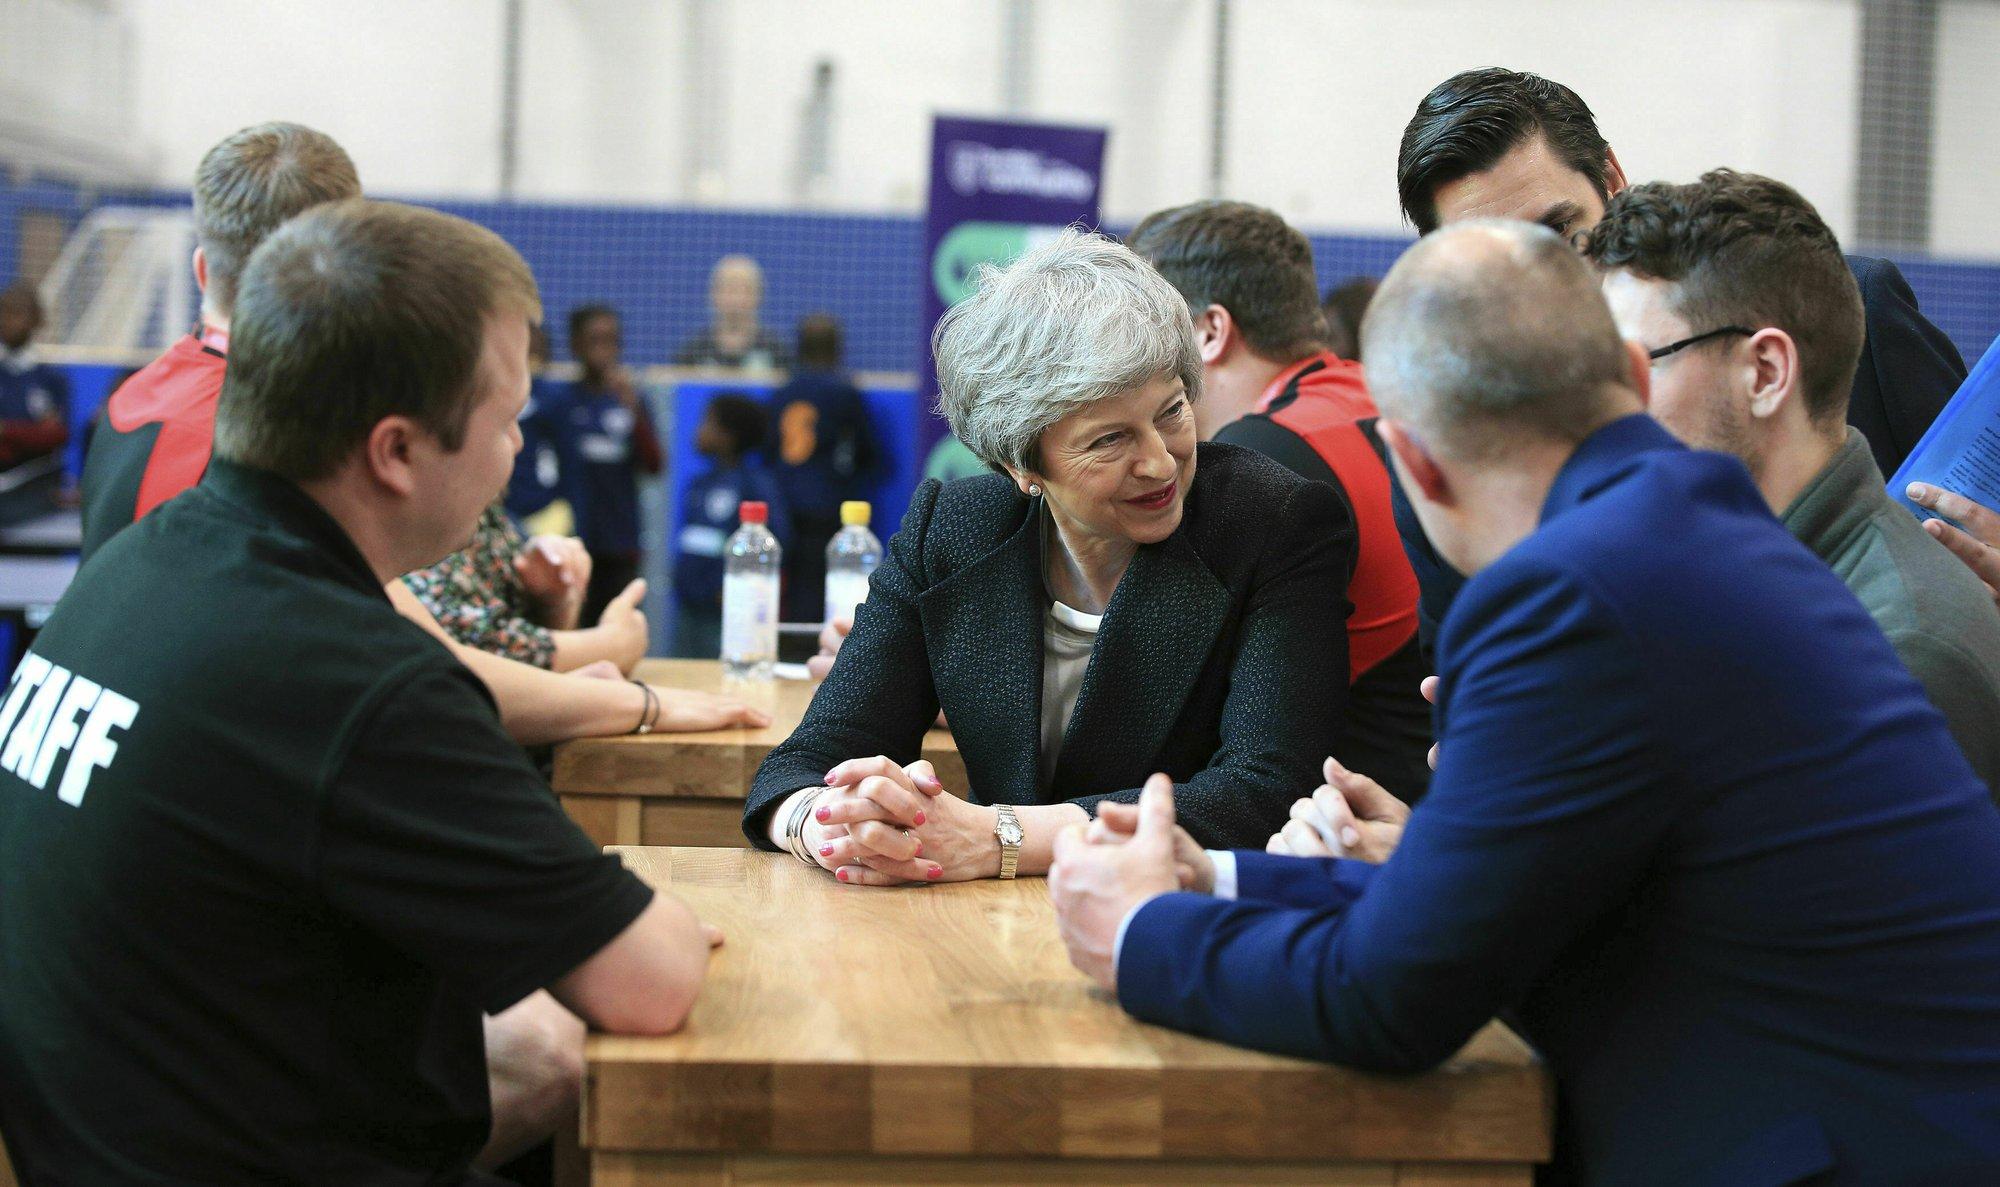 Faltering Brexit talks limp on amid UK political impasse